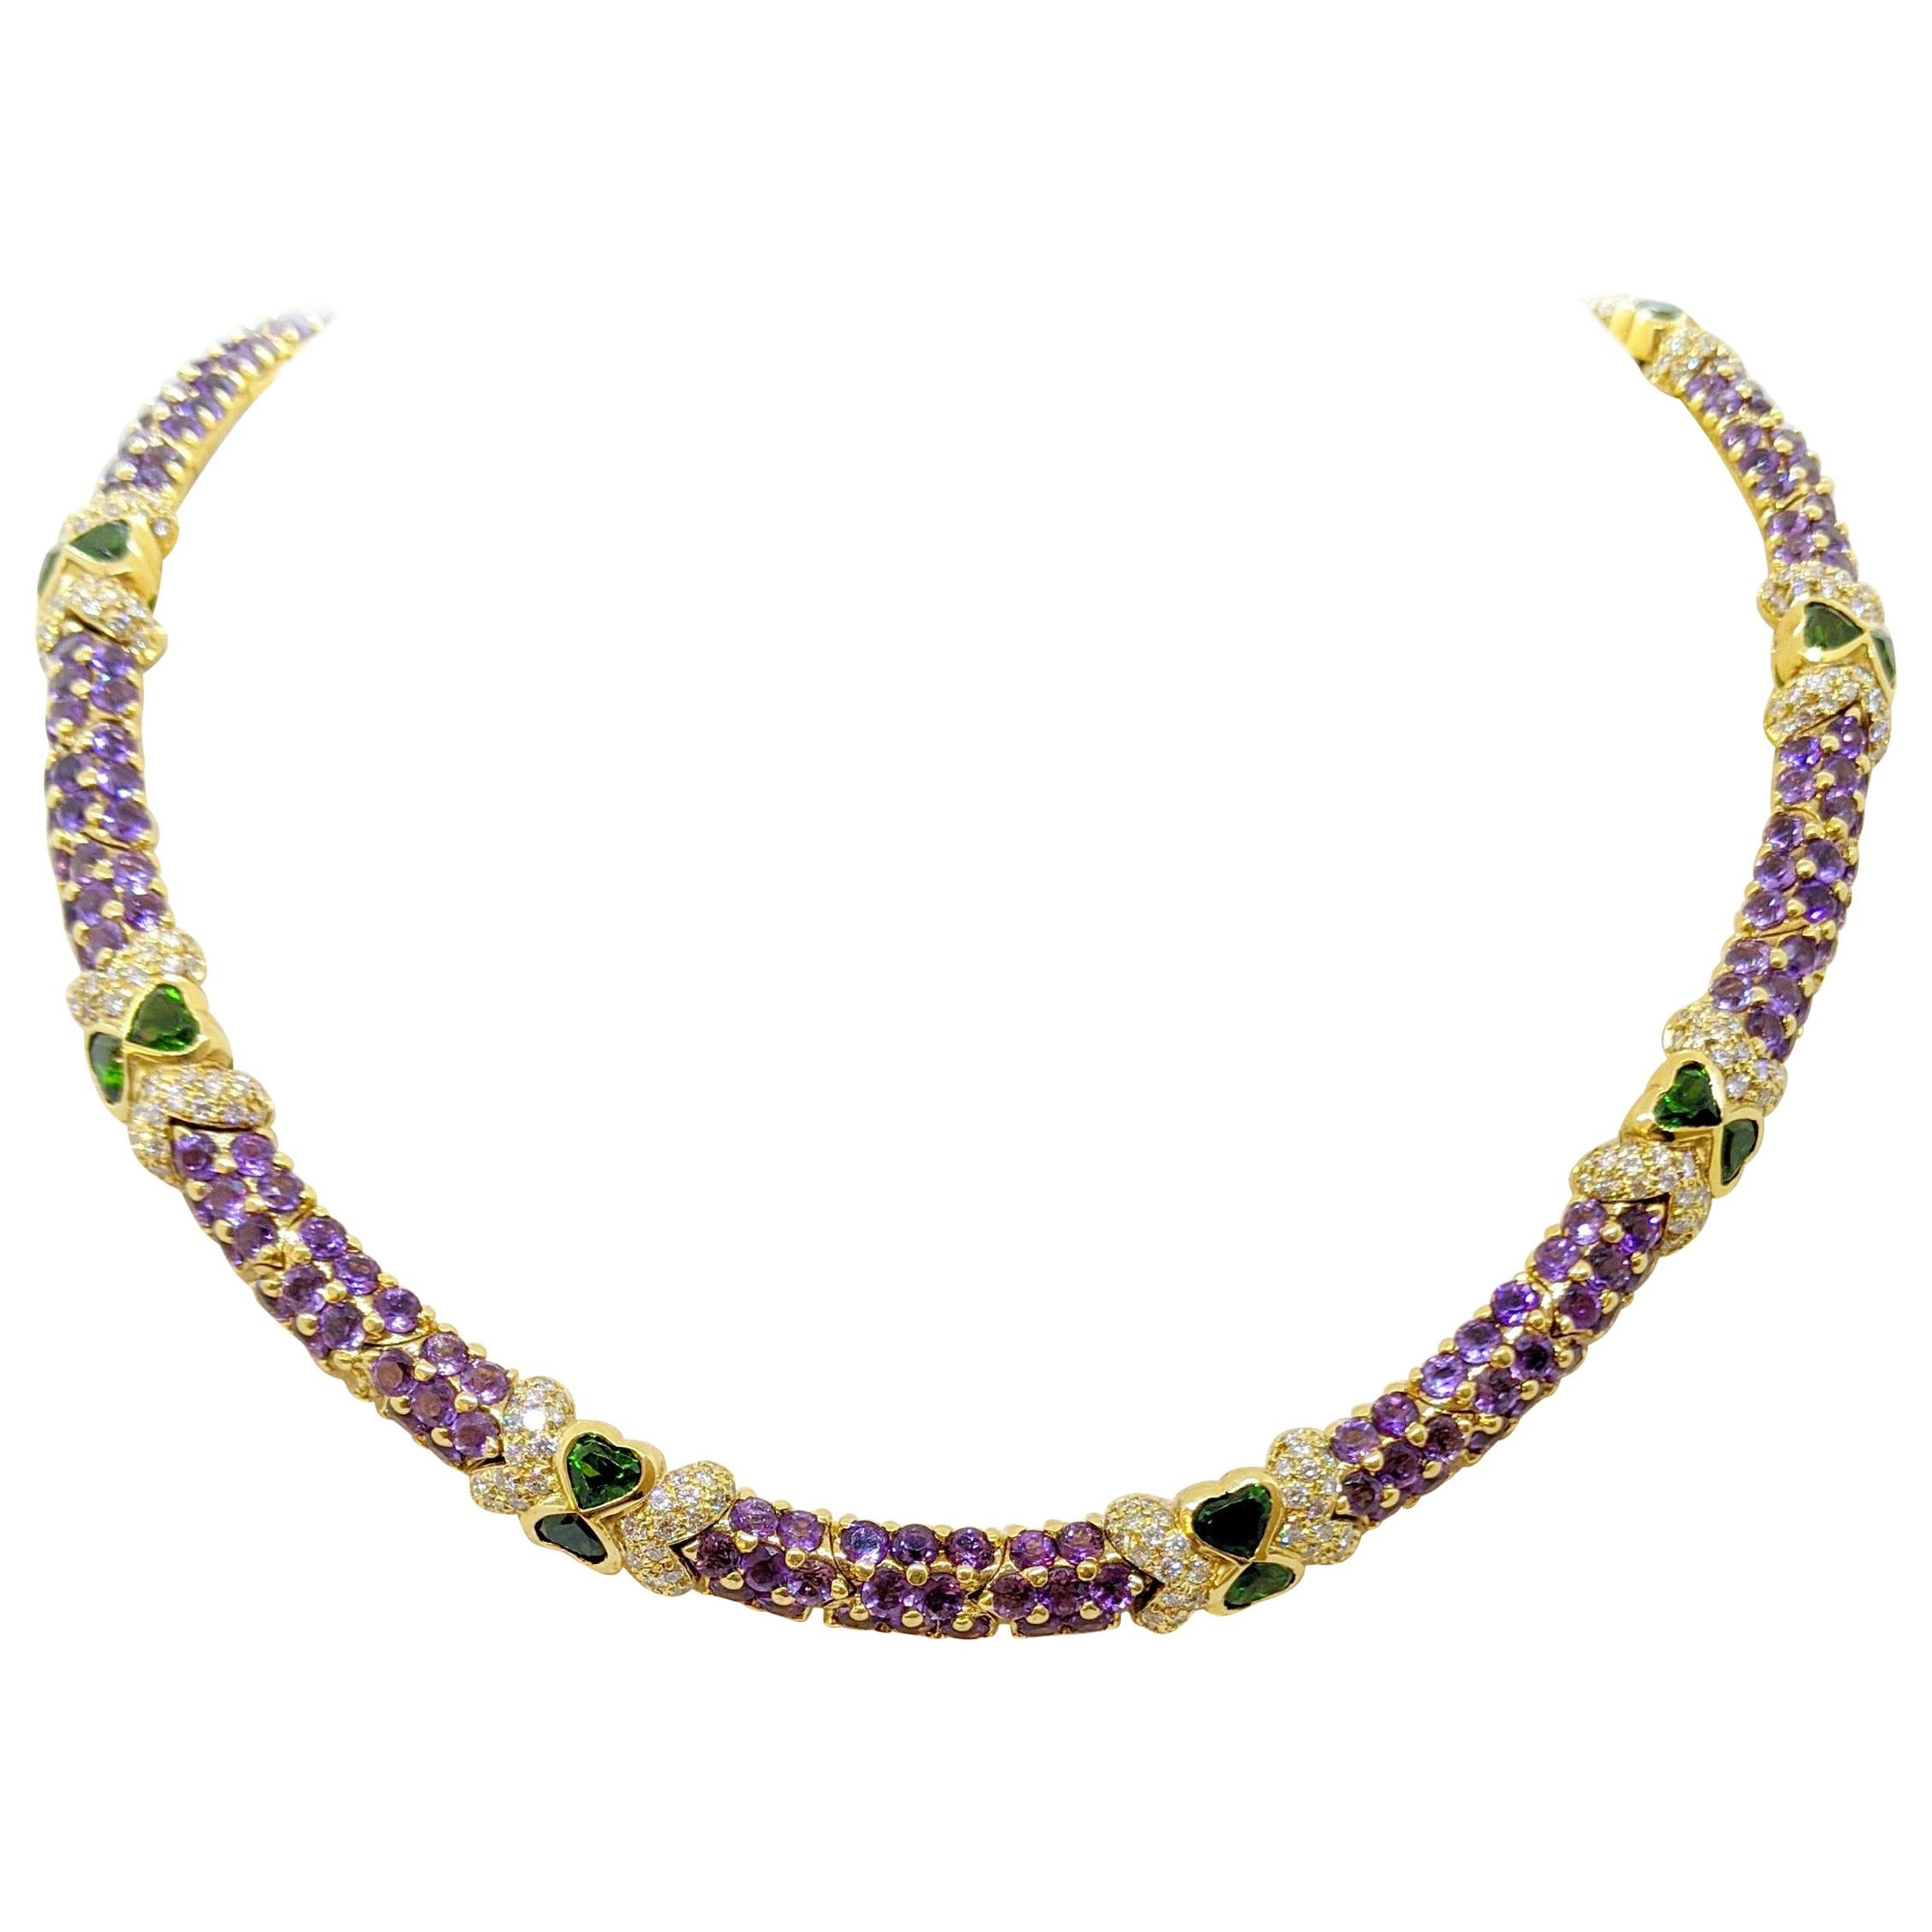 G. Verdi 18KT Yellow Gold Necklace with 32.19Ct. Amethyst & Tsavorites, Diamonds